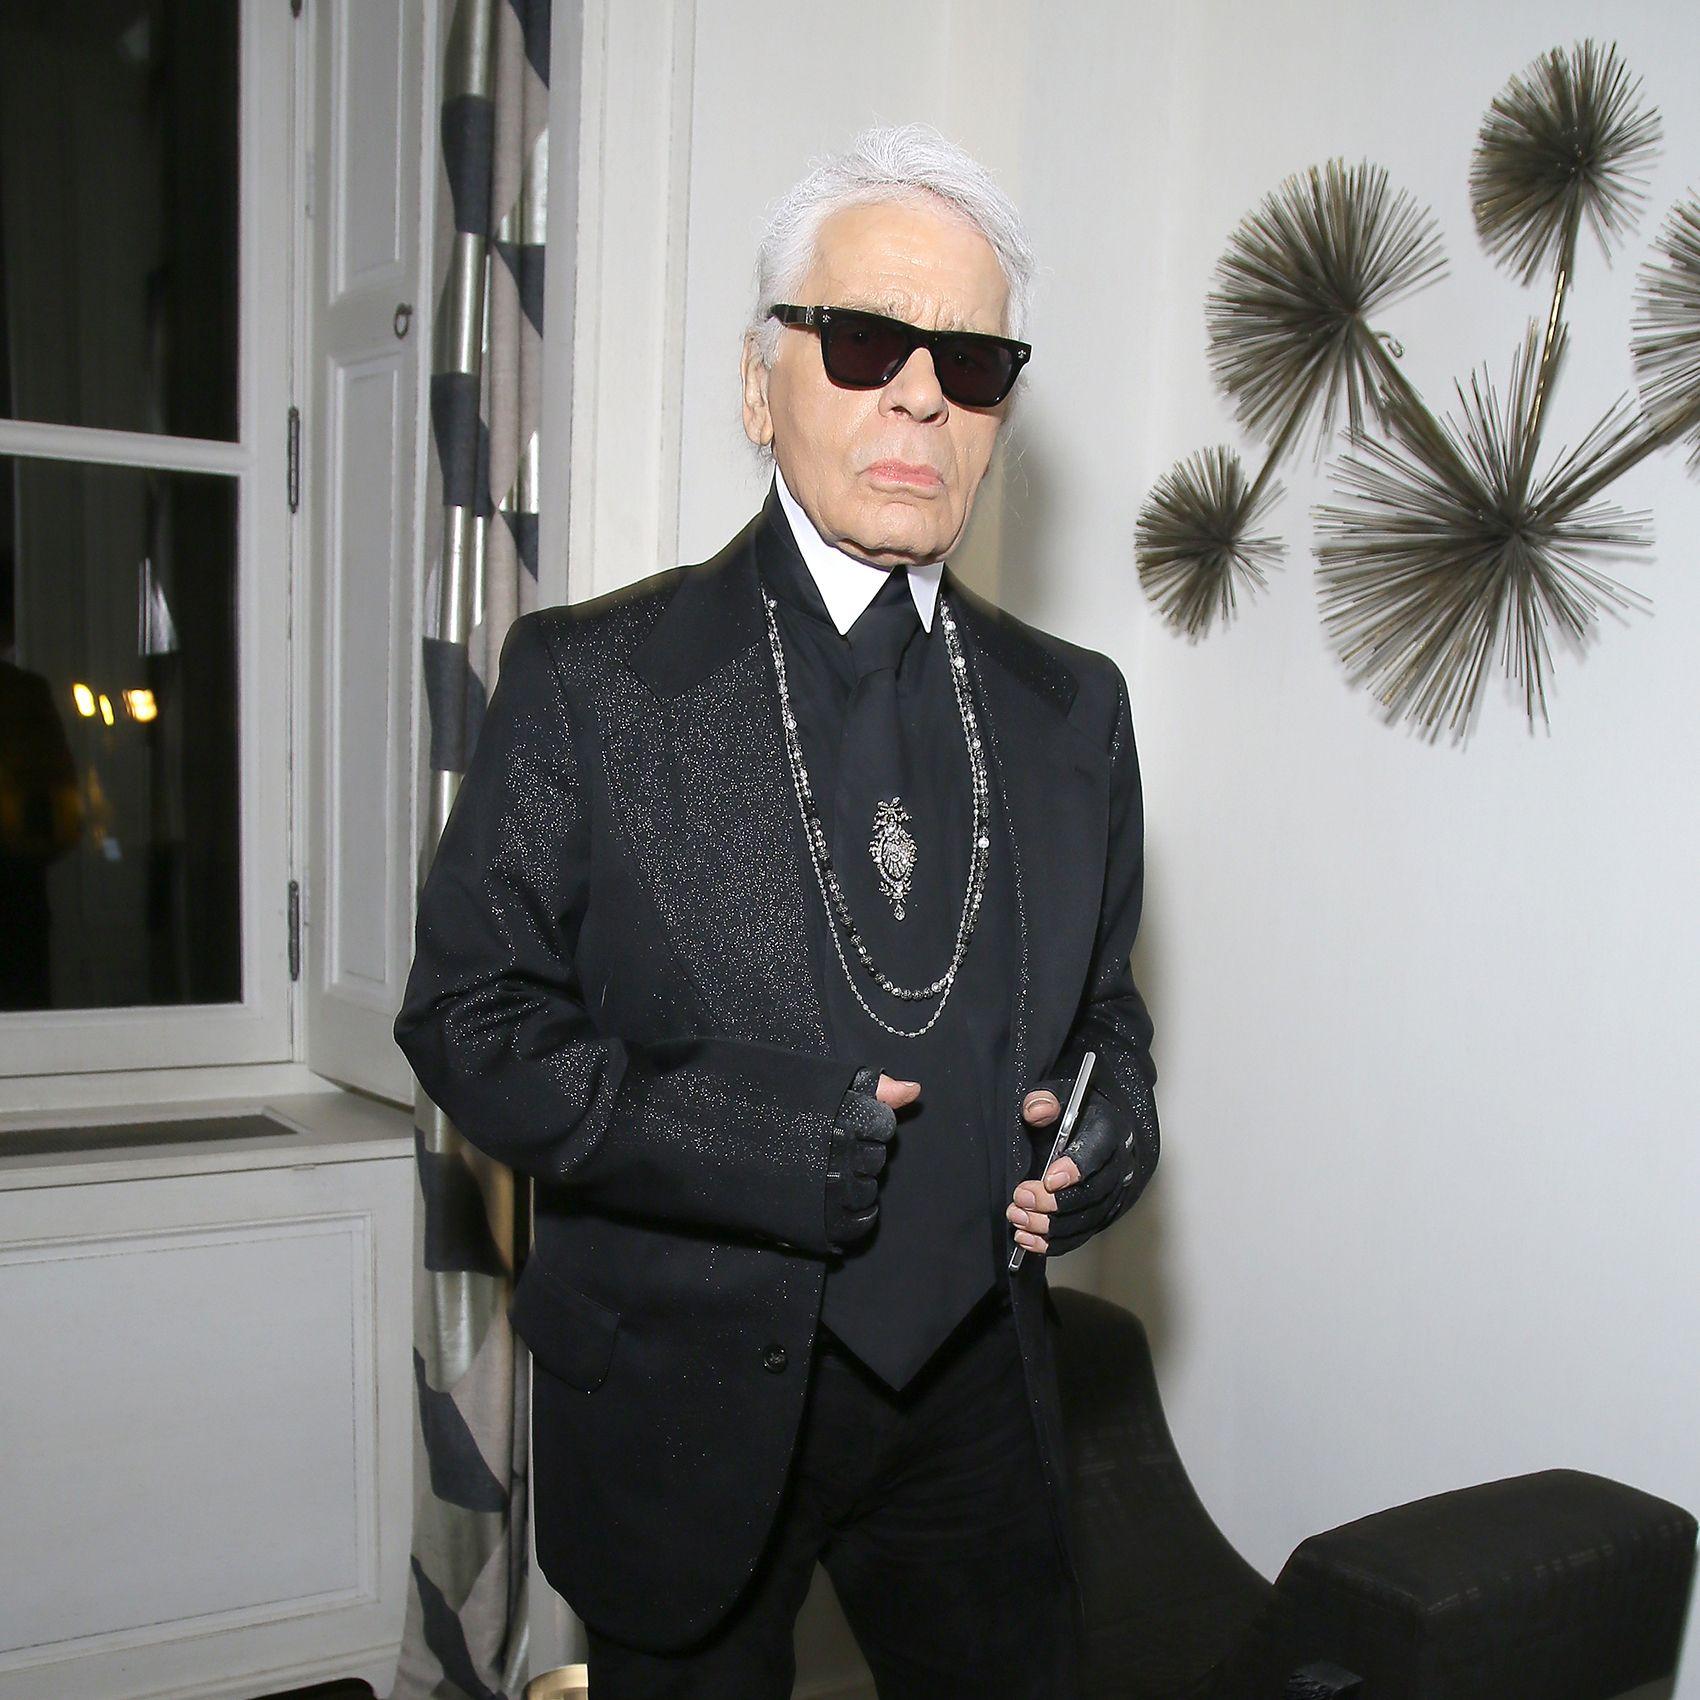 Karl Lagerfeld&#xA&#x3B;&#xA&#x3B;Party for Dasha Zhukova' cover for Wall Street Journal on January 27, 2015 in Paris, France.